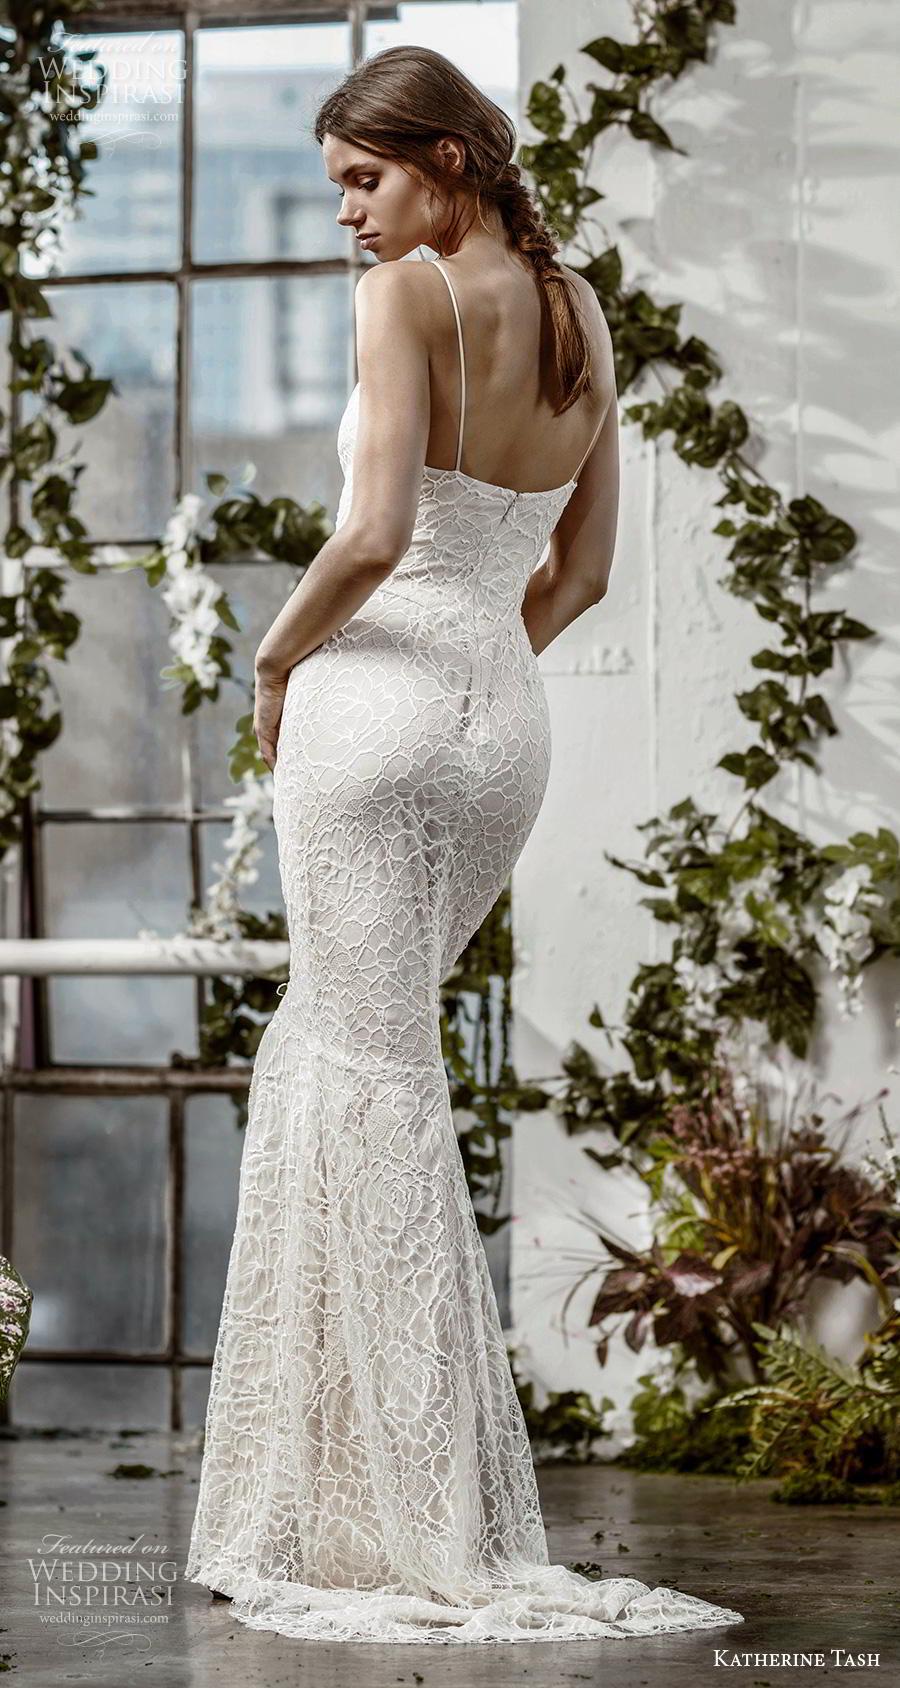 katherine tash fall 2019 bridal sleeveless spaghetti strap diamond neckline full embellishment elegant blush sheath fit and flare wedding dress sweep train (8) bv